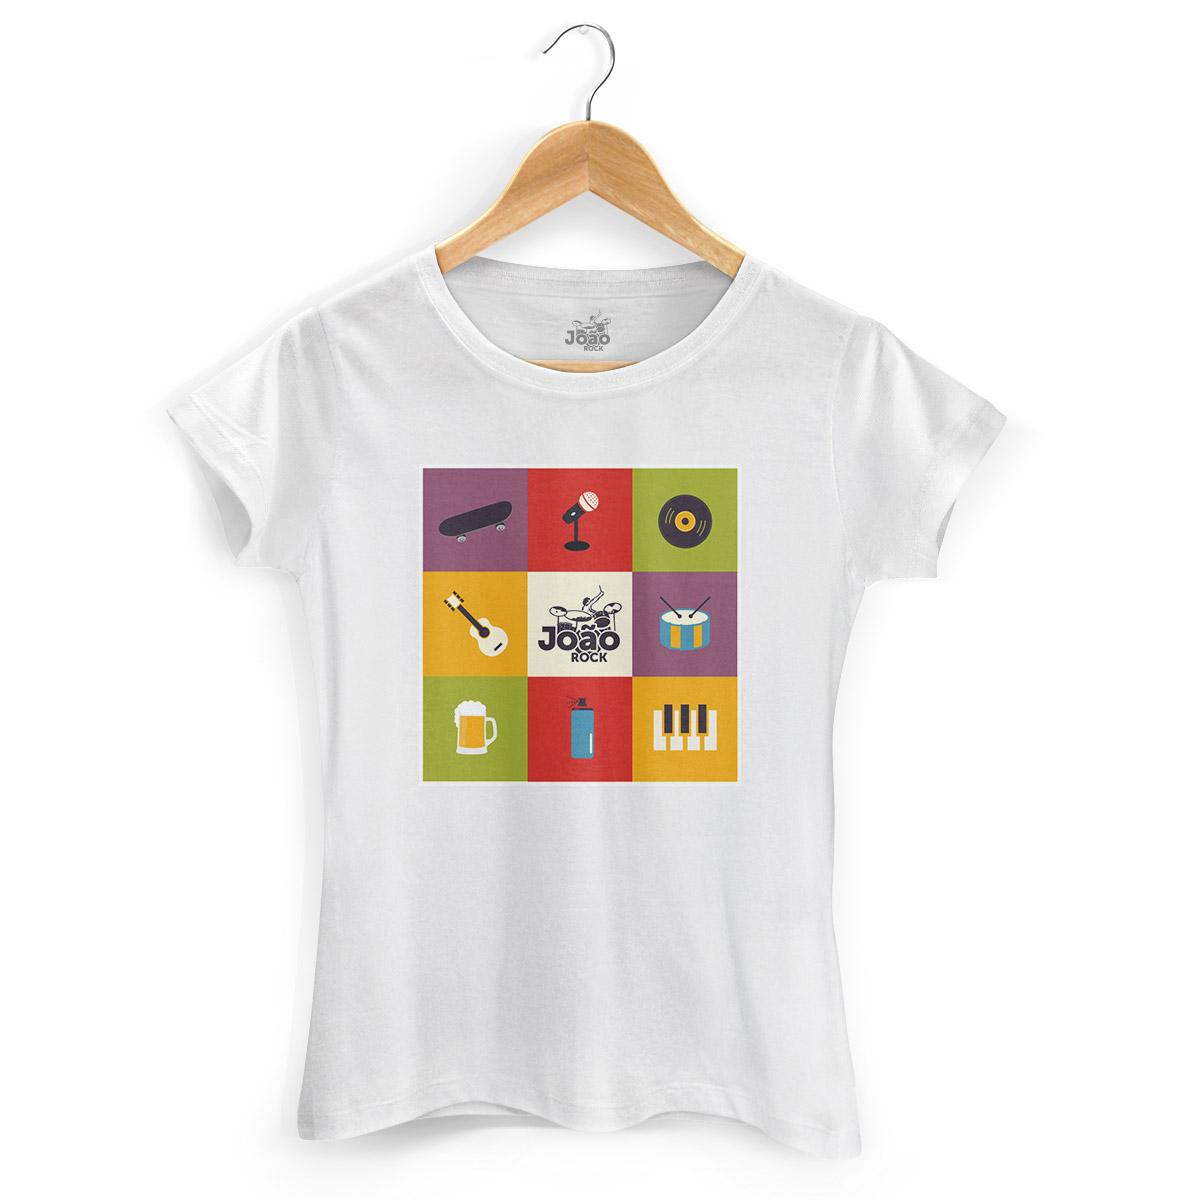 Camiseta Feminina João Rock Instrumentos